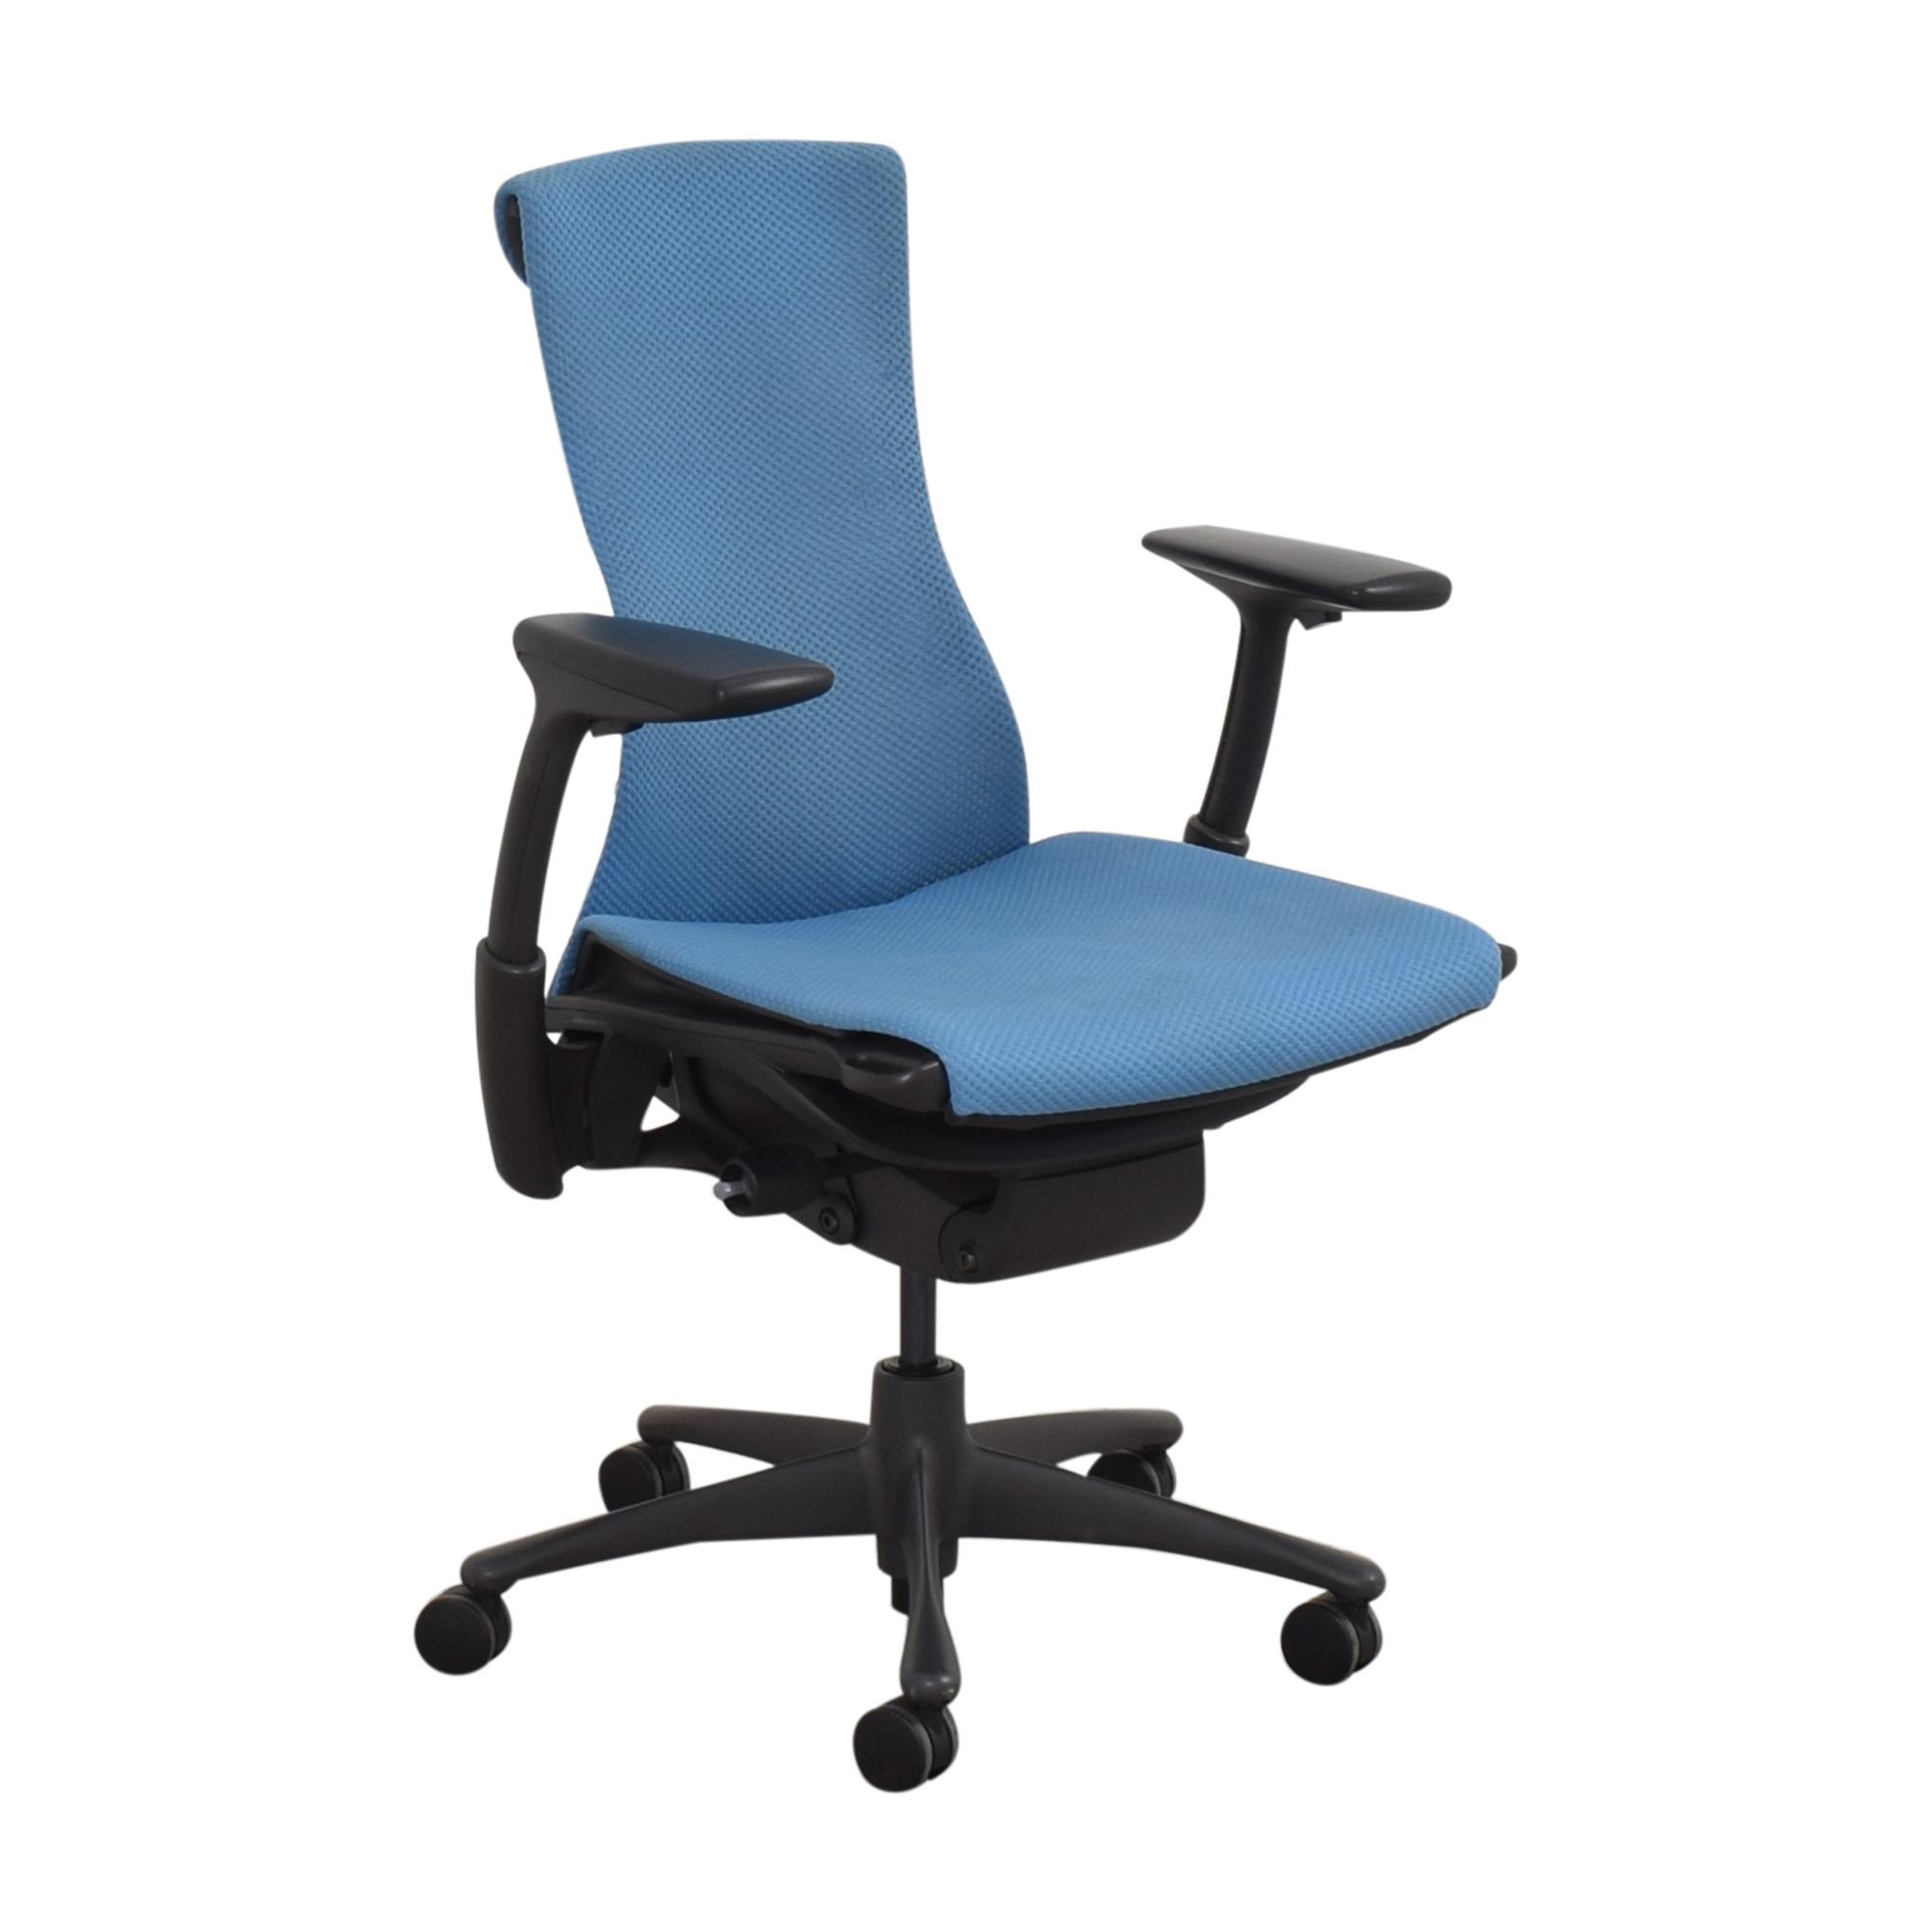 Herman Miller Herman Miller Embody Chair second hand